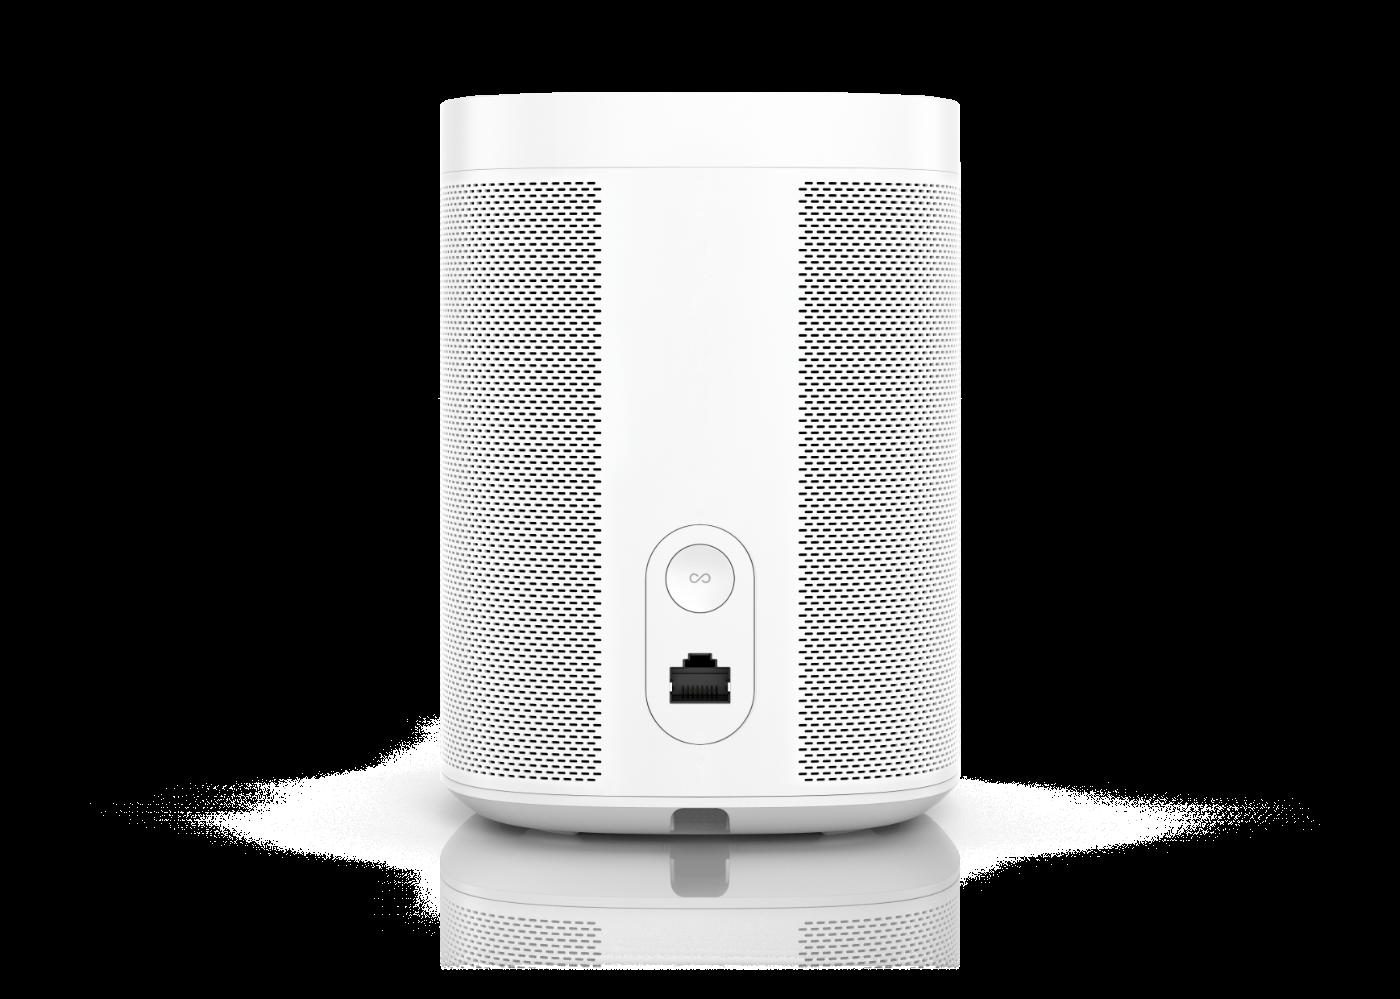 One_White-Product_Render-Back-Q4FY19_MST-MST_fid51613